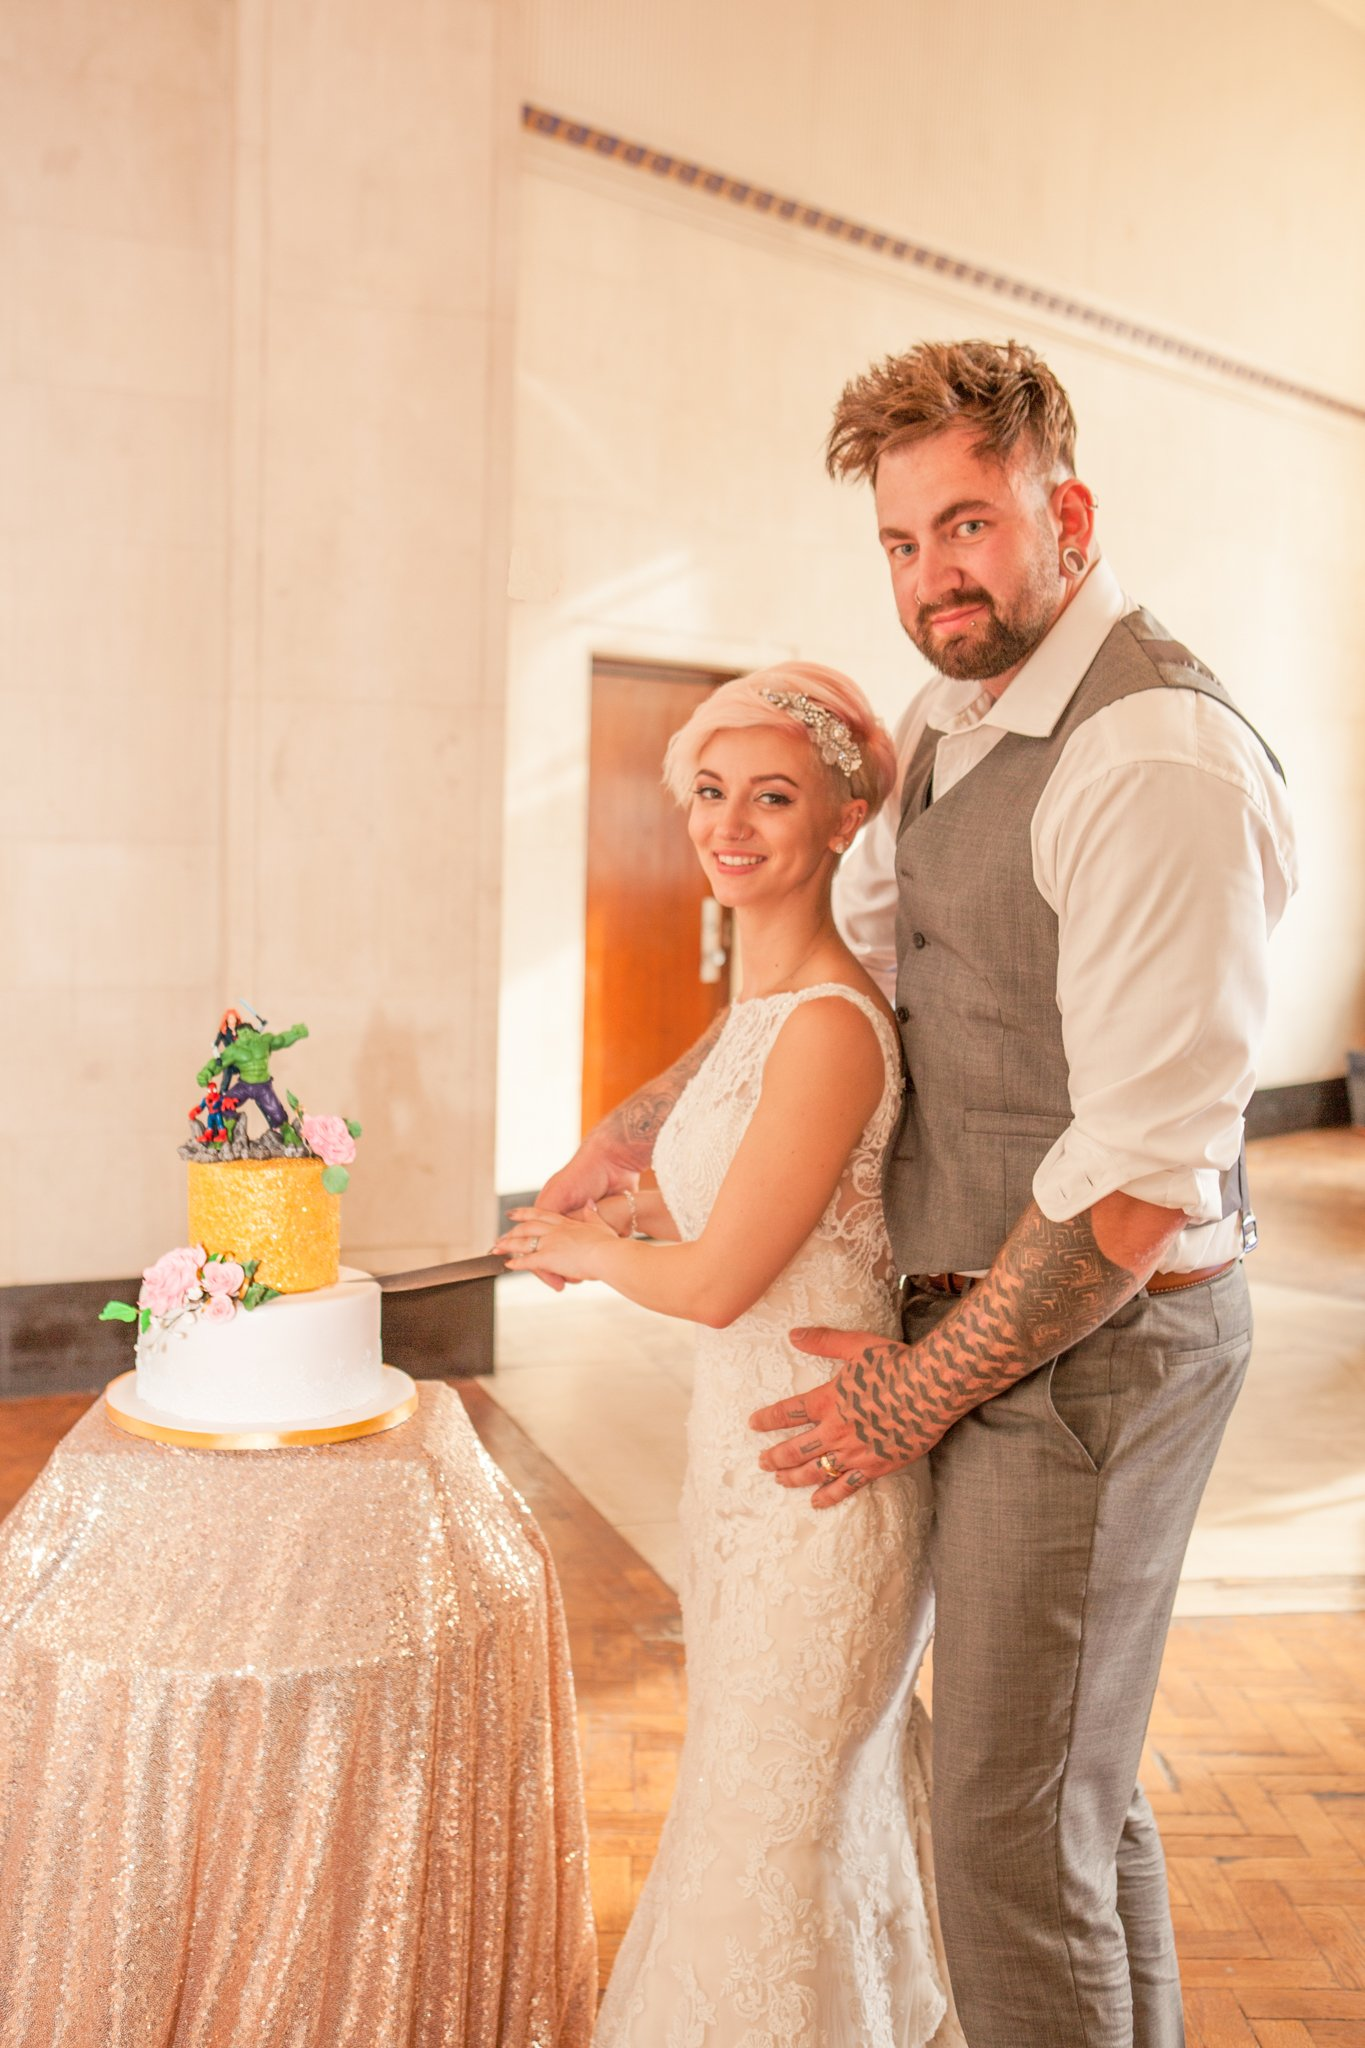 Cutting the cake,Portland House Cardiff Wedding, Tania Miller Photography, Cardiff wedding photographer